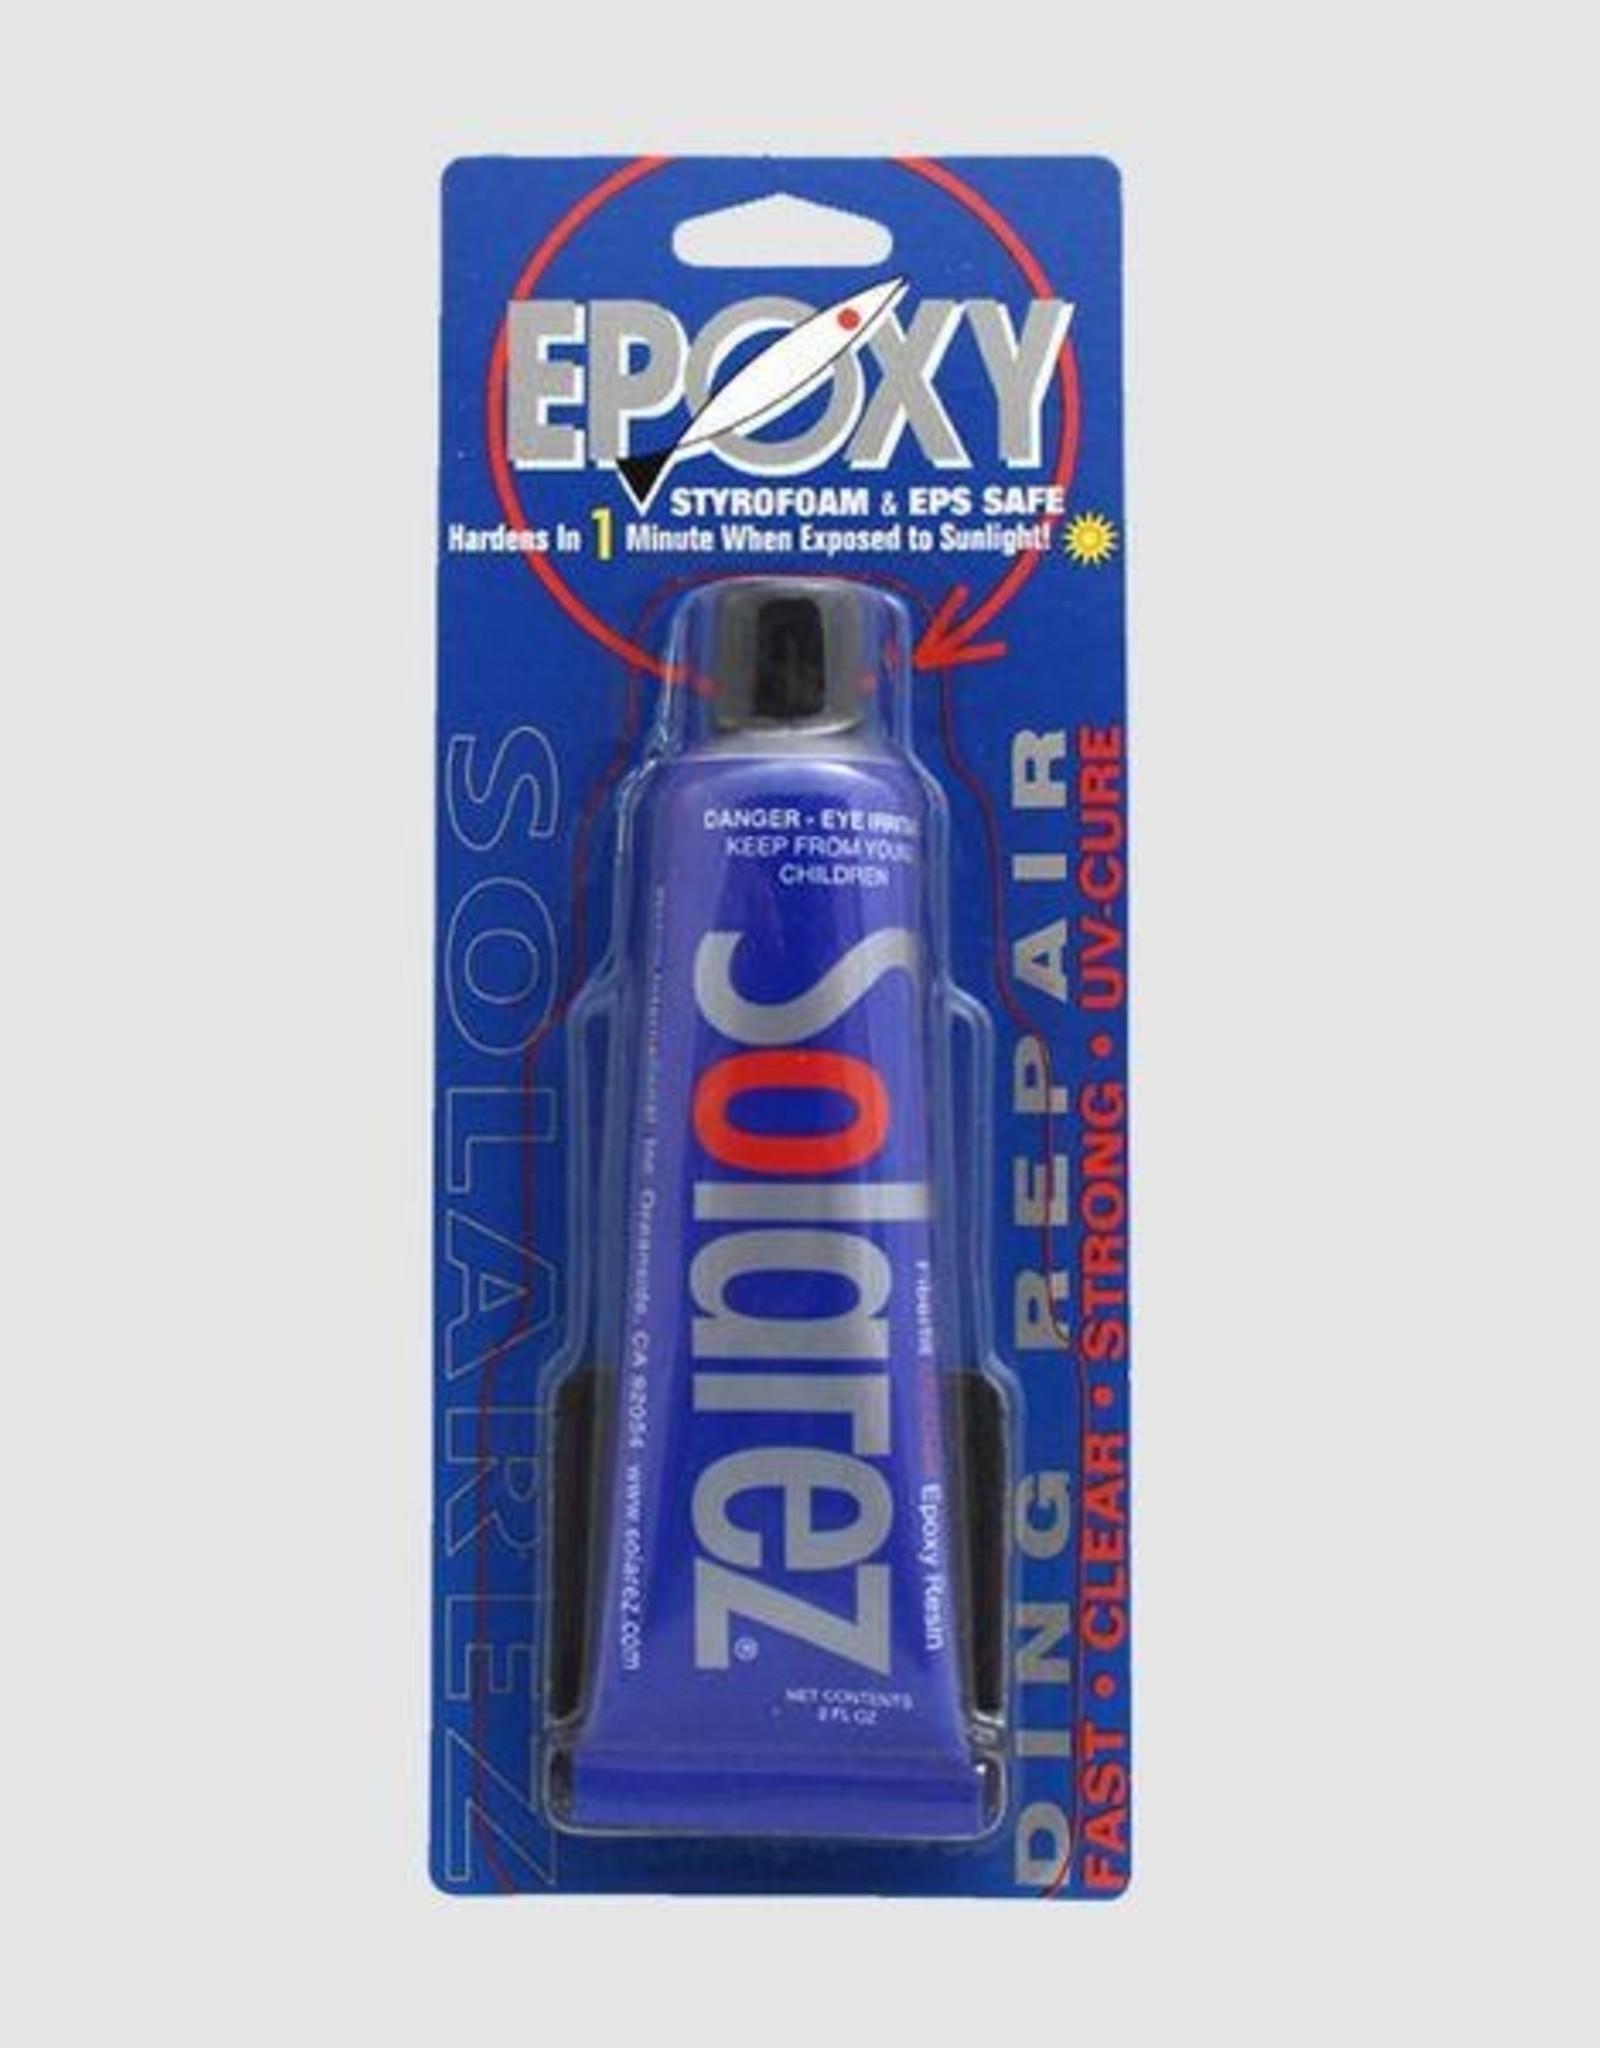 FCS Solarez Epoxy Ding Repair 2.0 oz tube (EPS safe)